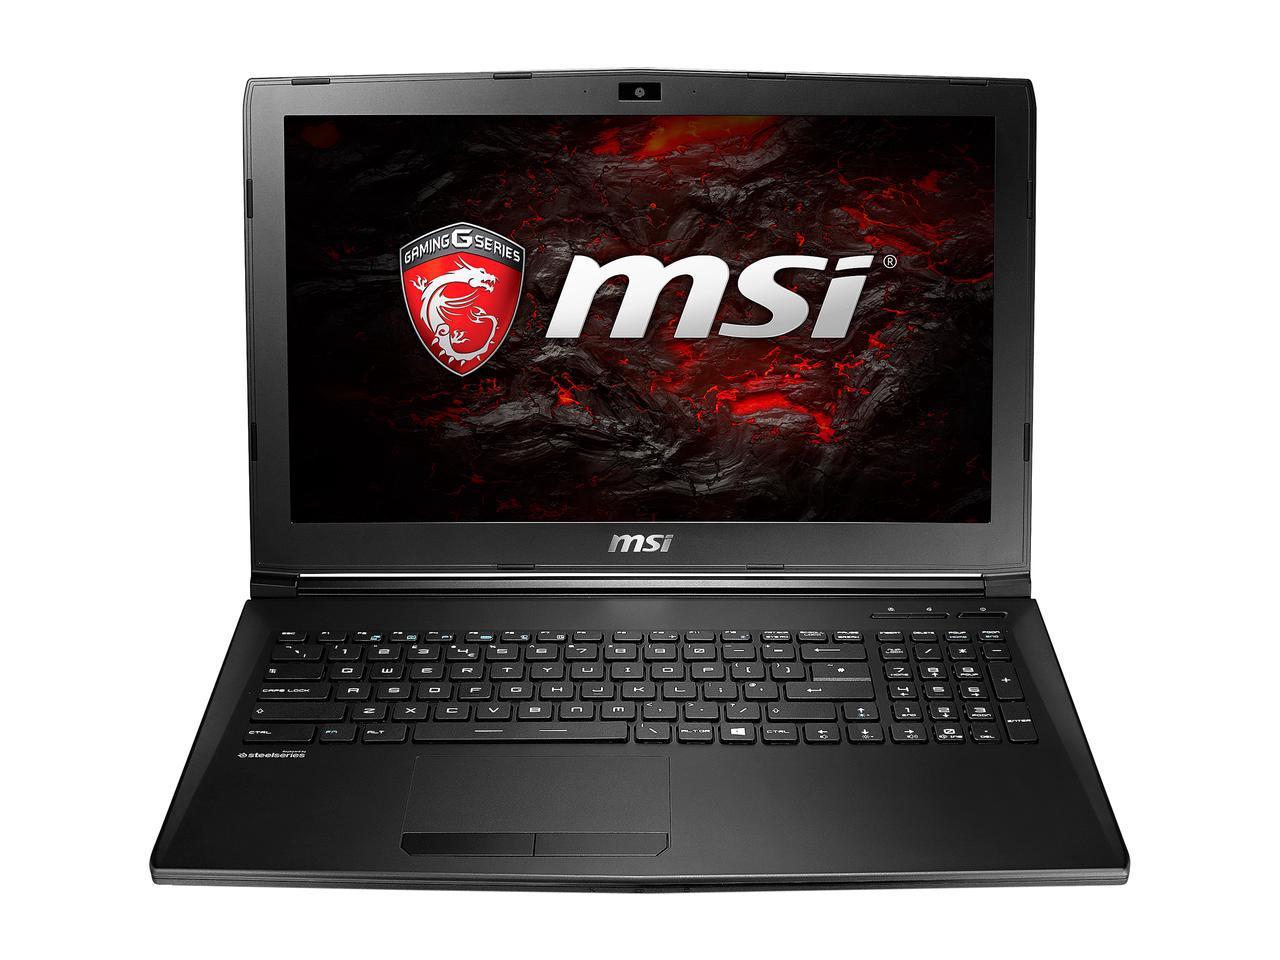 "MSI 15.6"" GL62M Gaming Laptop: i7-7700HQ, 128GB SSD + 1TB HDD, GeForce GTX 1050, Win 10 + Rocket League/Journal/Backpack $779 AR or Less + Free Shipping via Newegg"